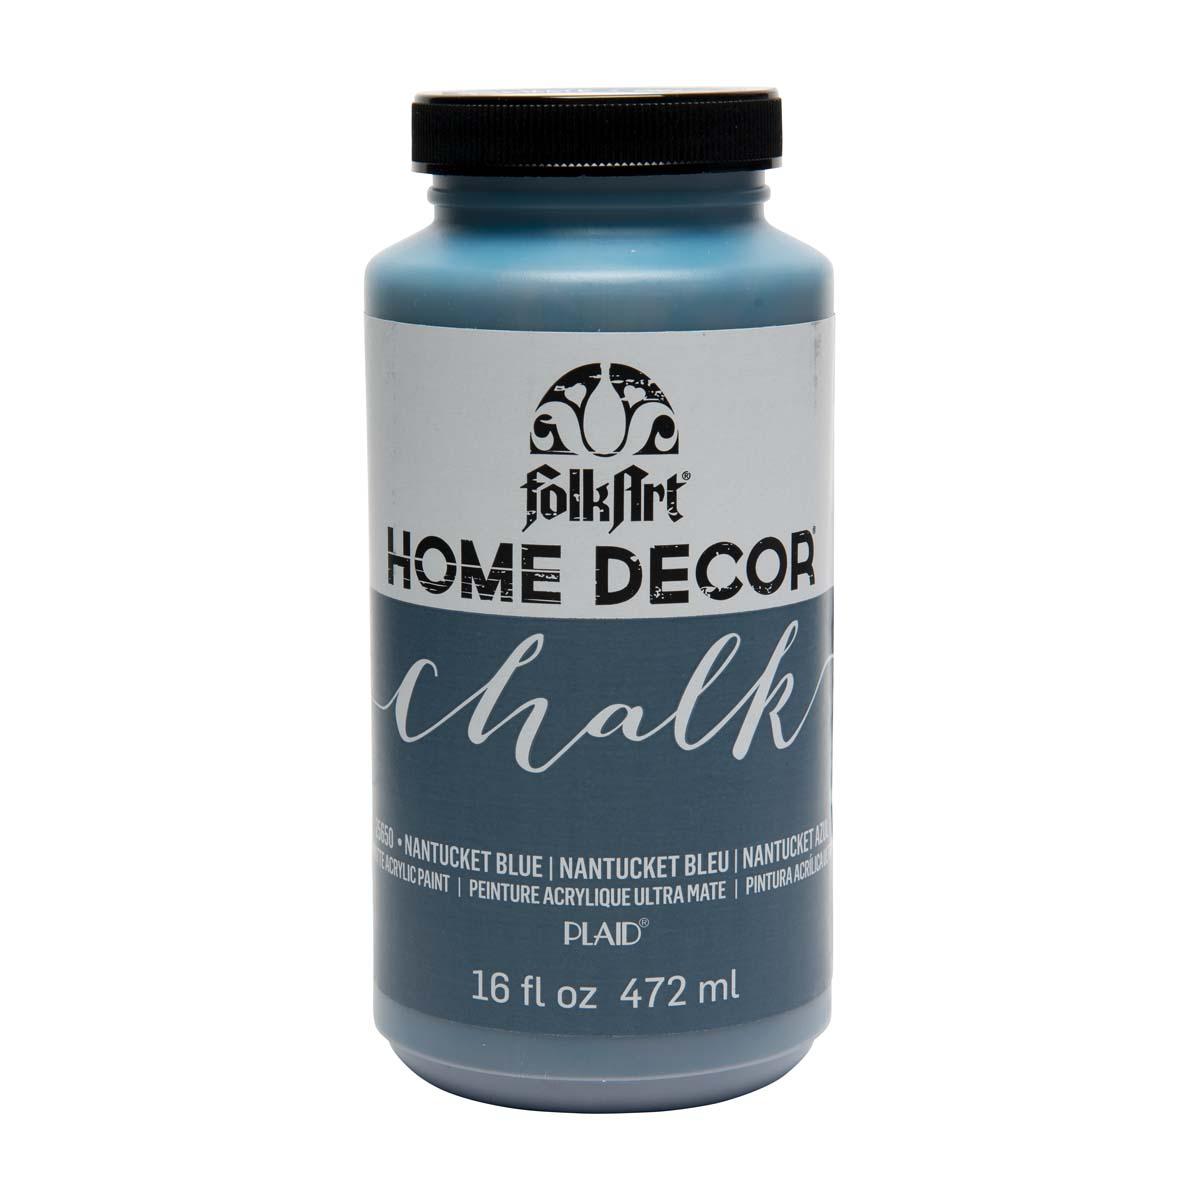 FolkArt ® Home Decor™ Chalk - Nantucket Blue, 16 oz.